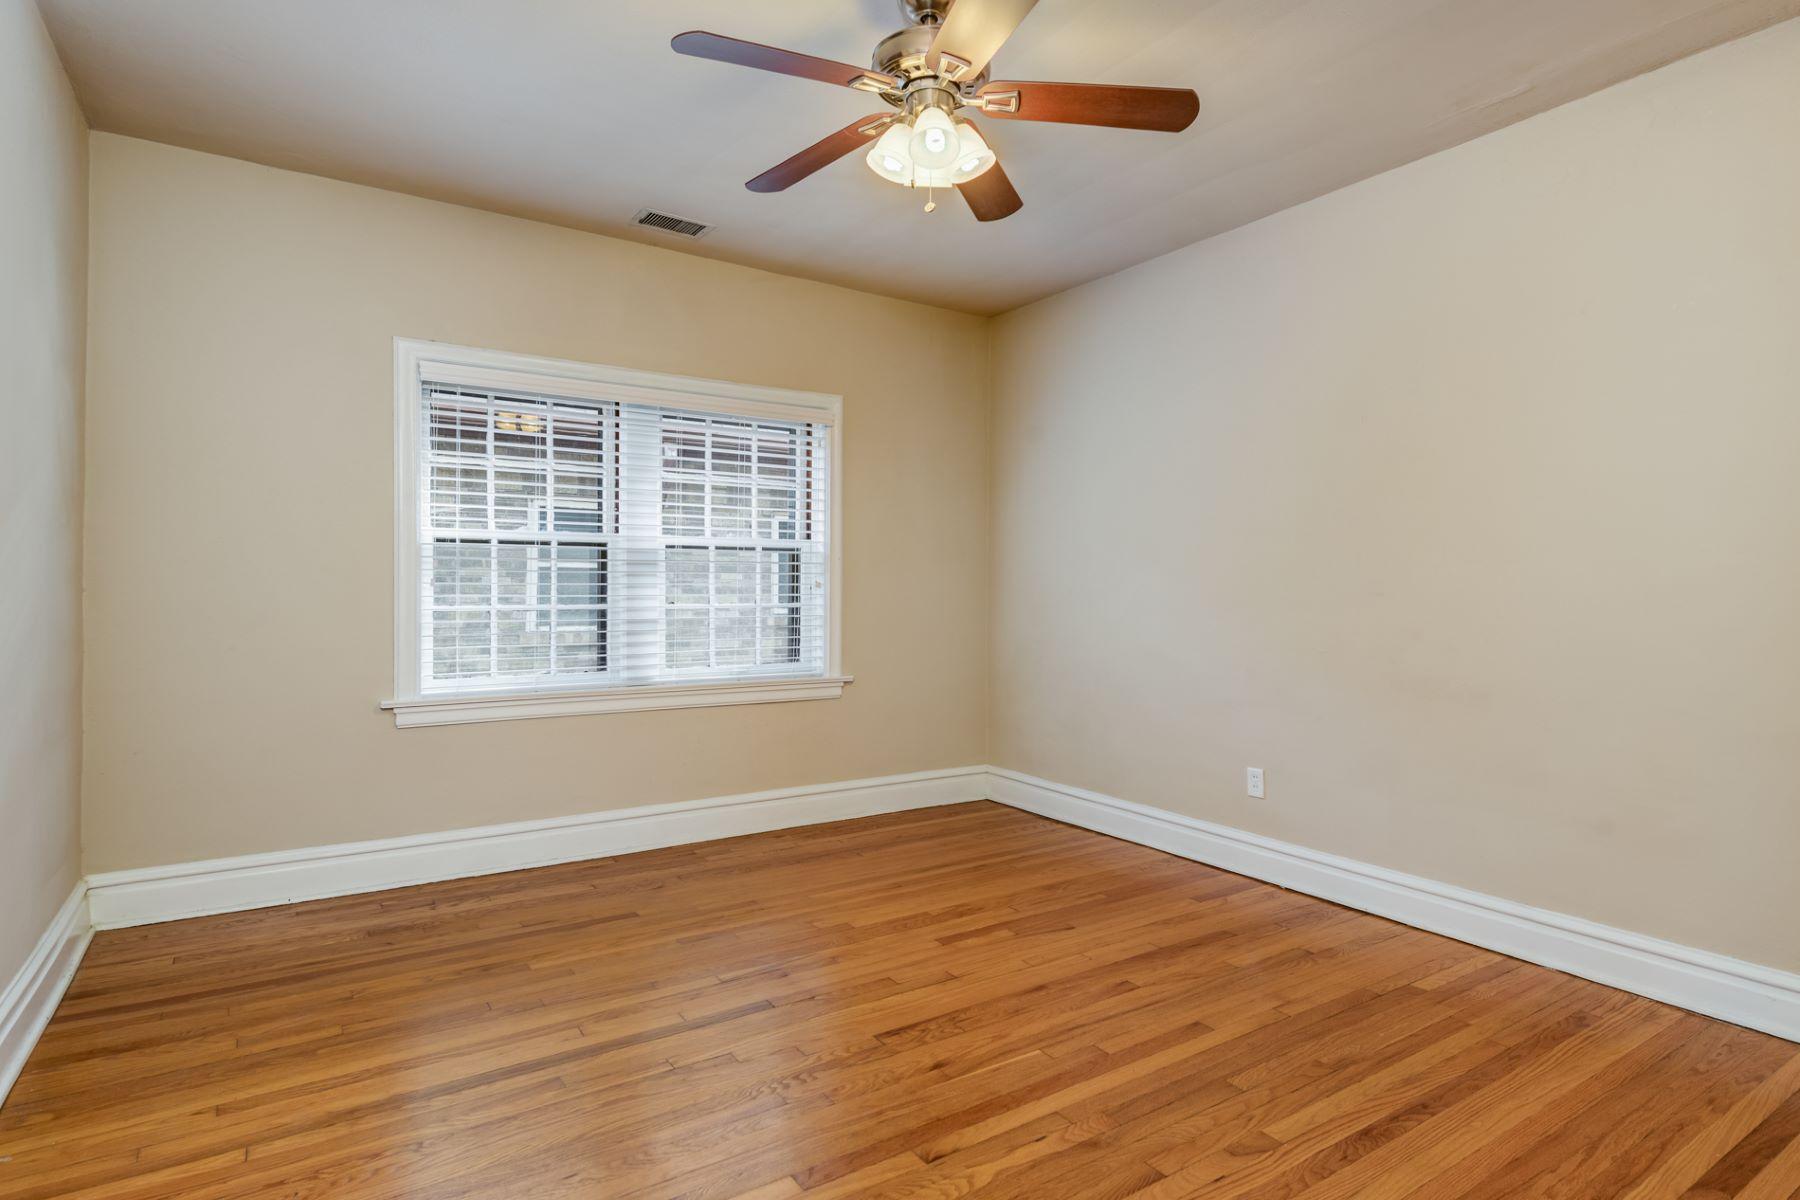 Additional photo for property listing at Pershing Ave 7369 Pershing Ave # 2E University City, Missouri 63130 United States